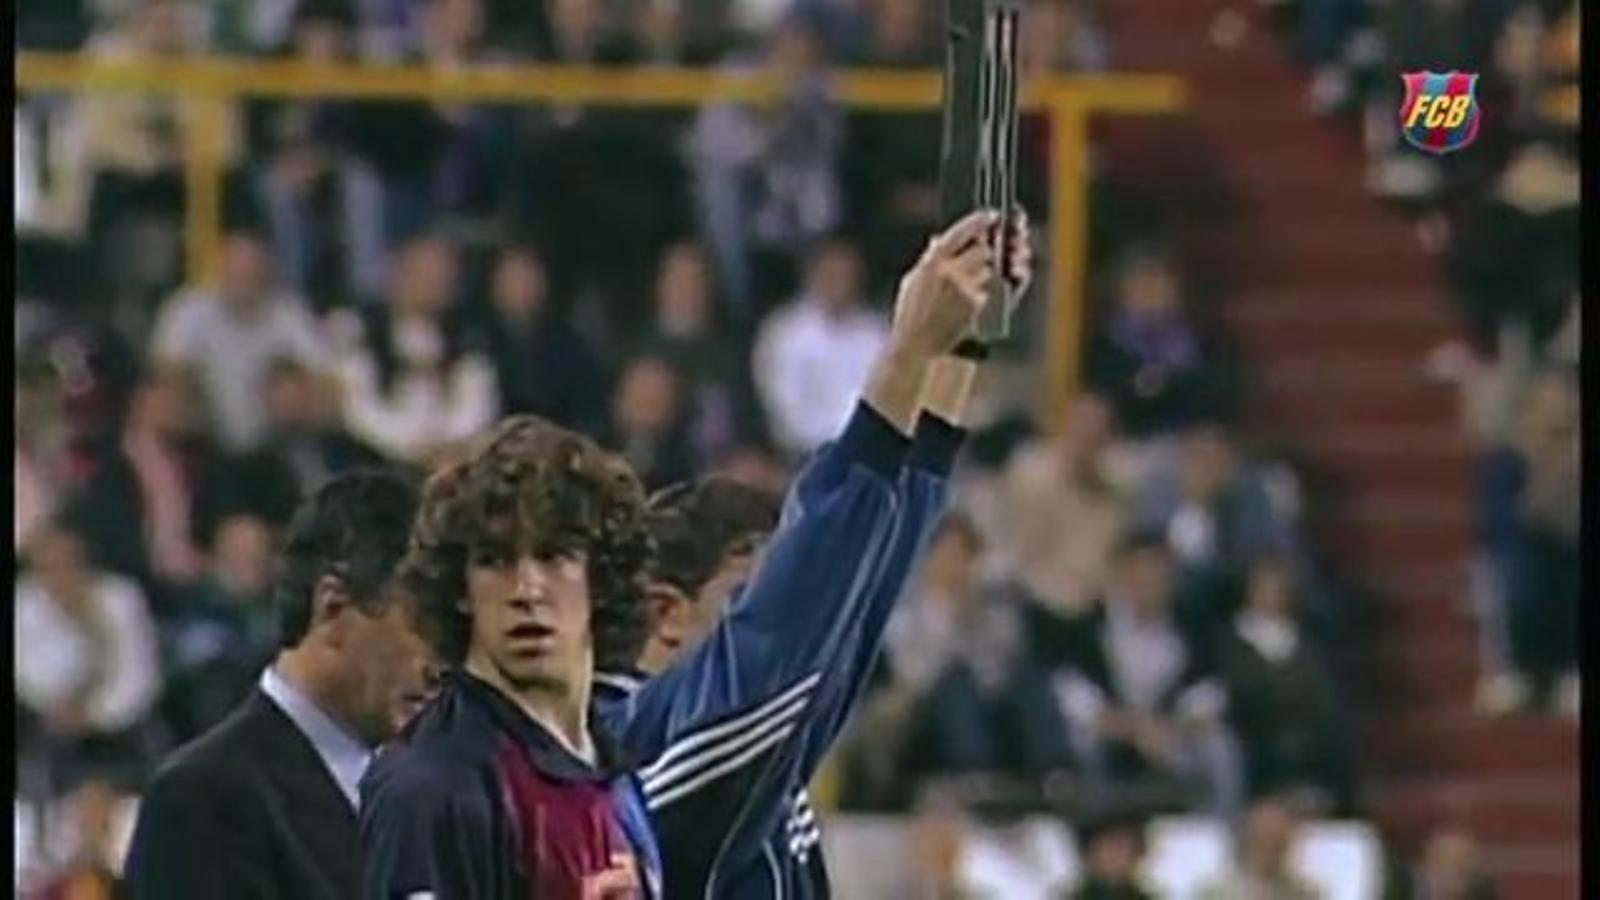 La trajectòria de Carles Puyol al Barça